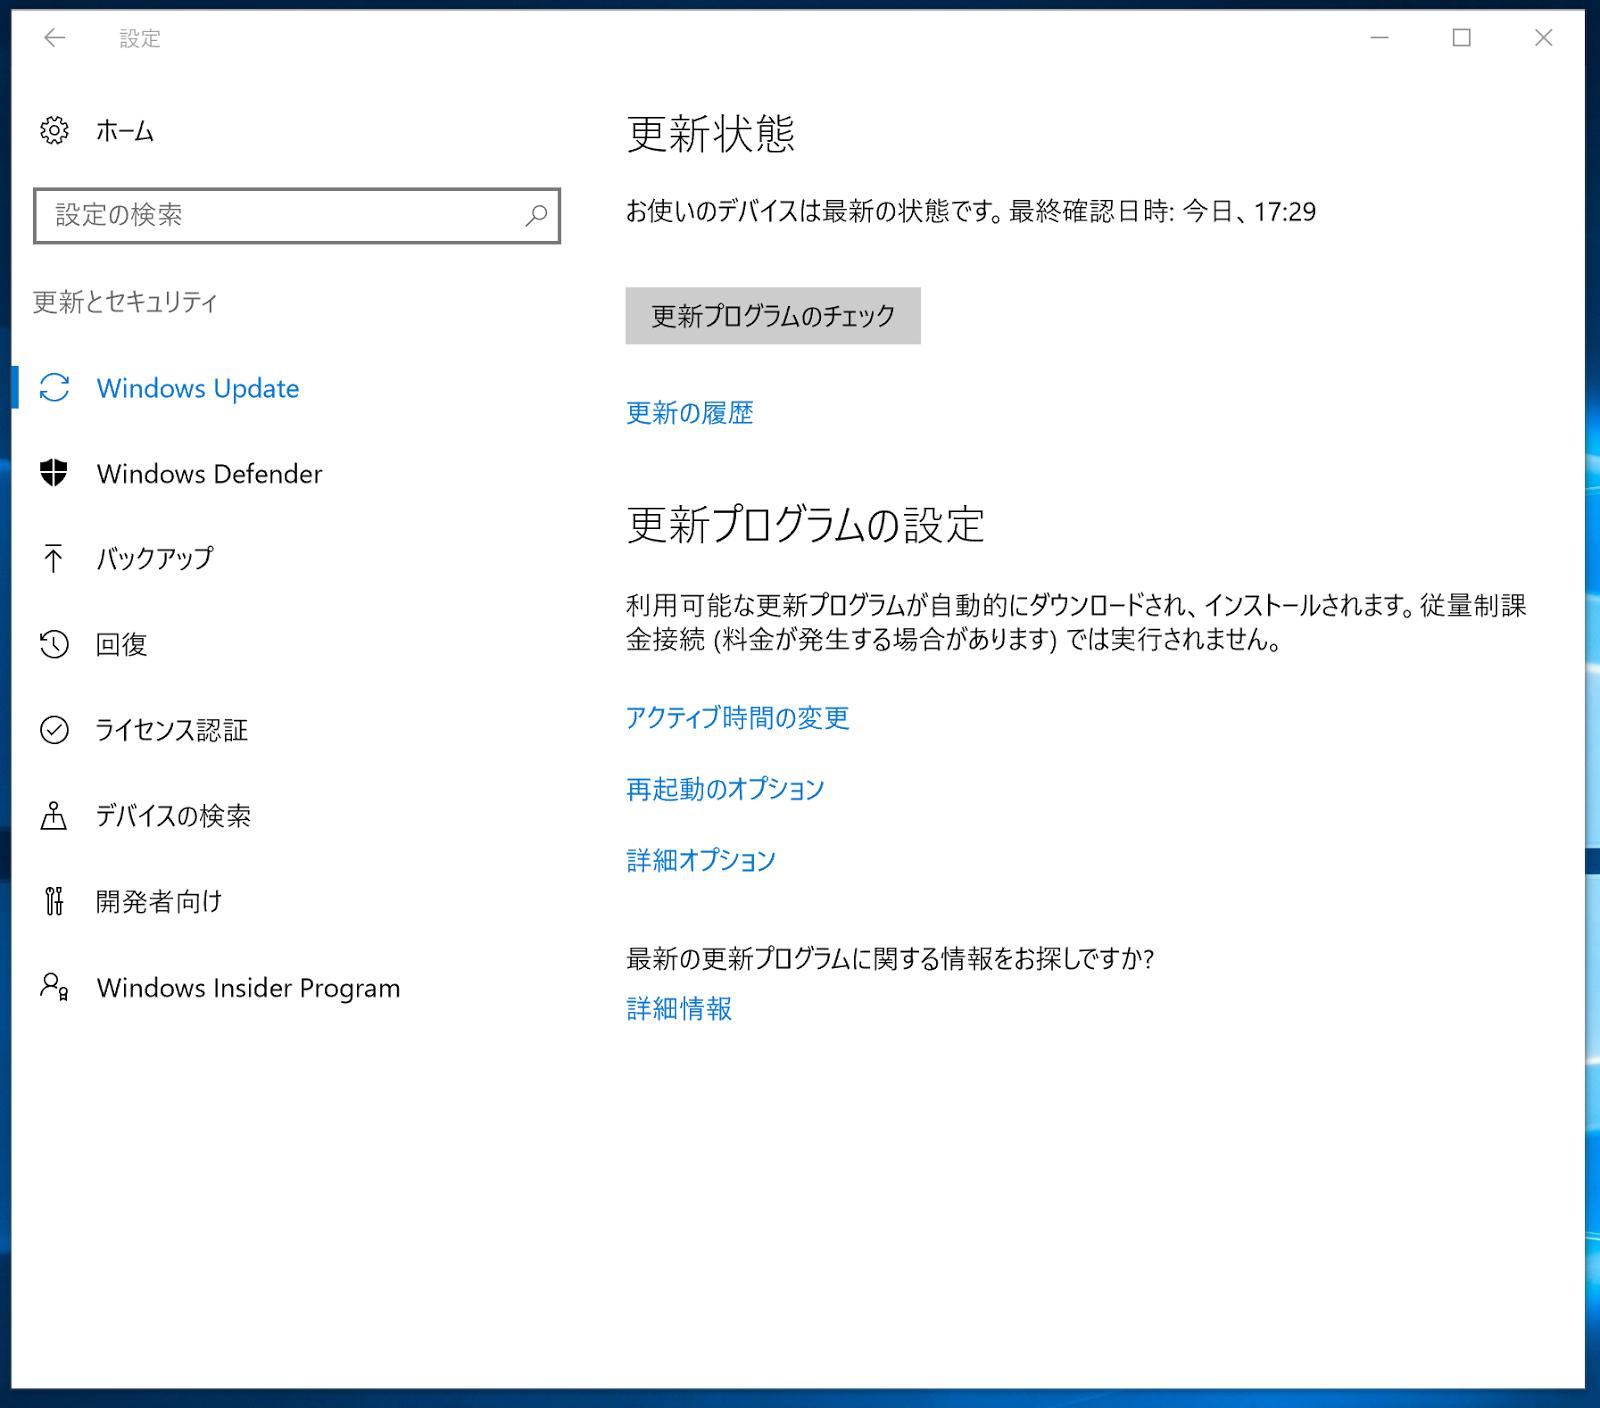 8570w blog: Windows 10 Pro で Windows Update による機能更新を延期する方法